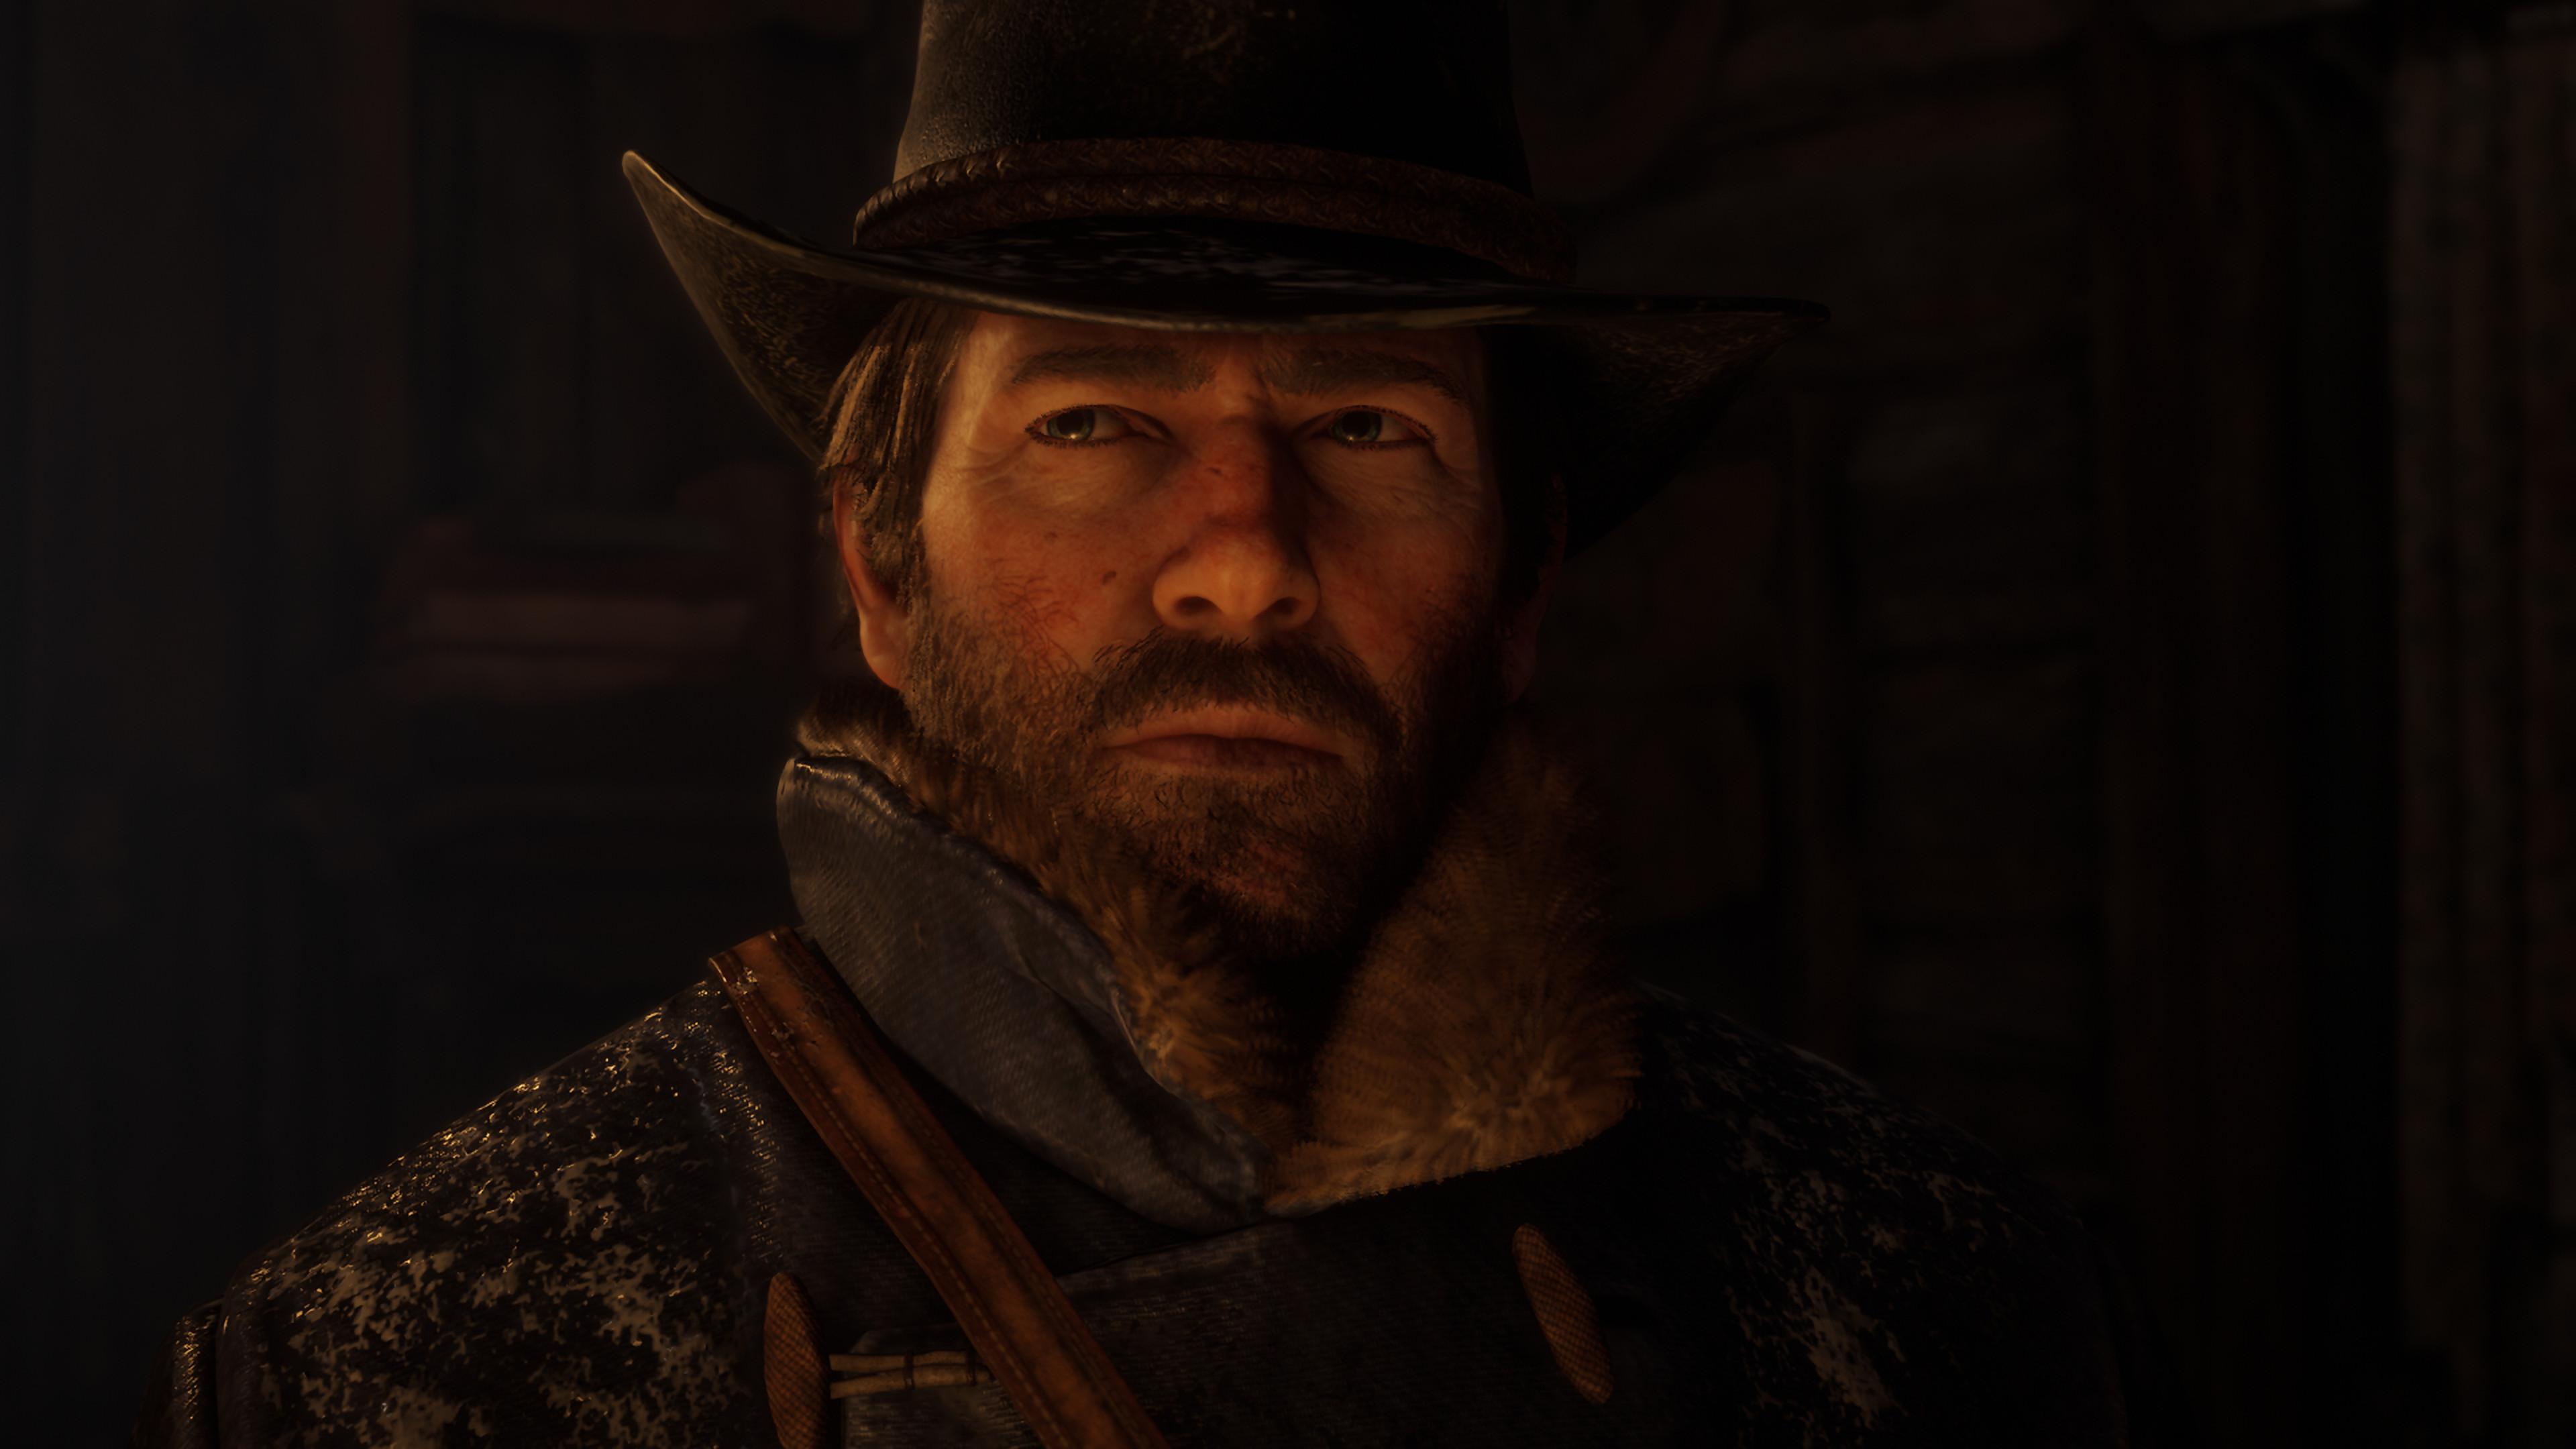 Wallpaper  Rockstar Games, Red Dead Redemption, Red Dead